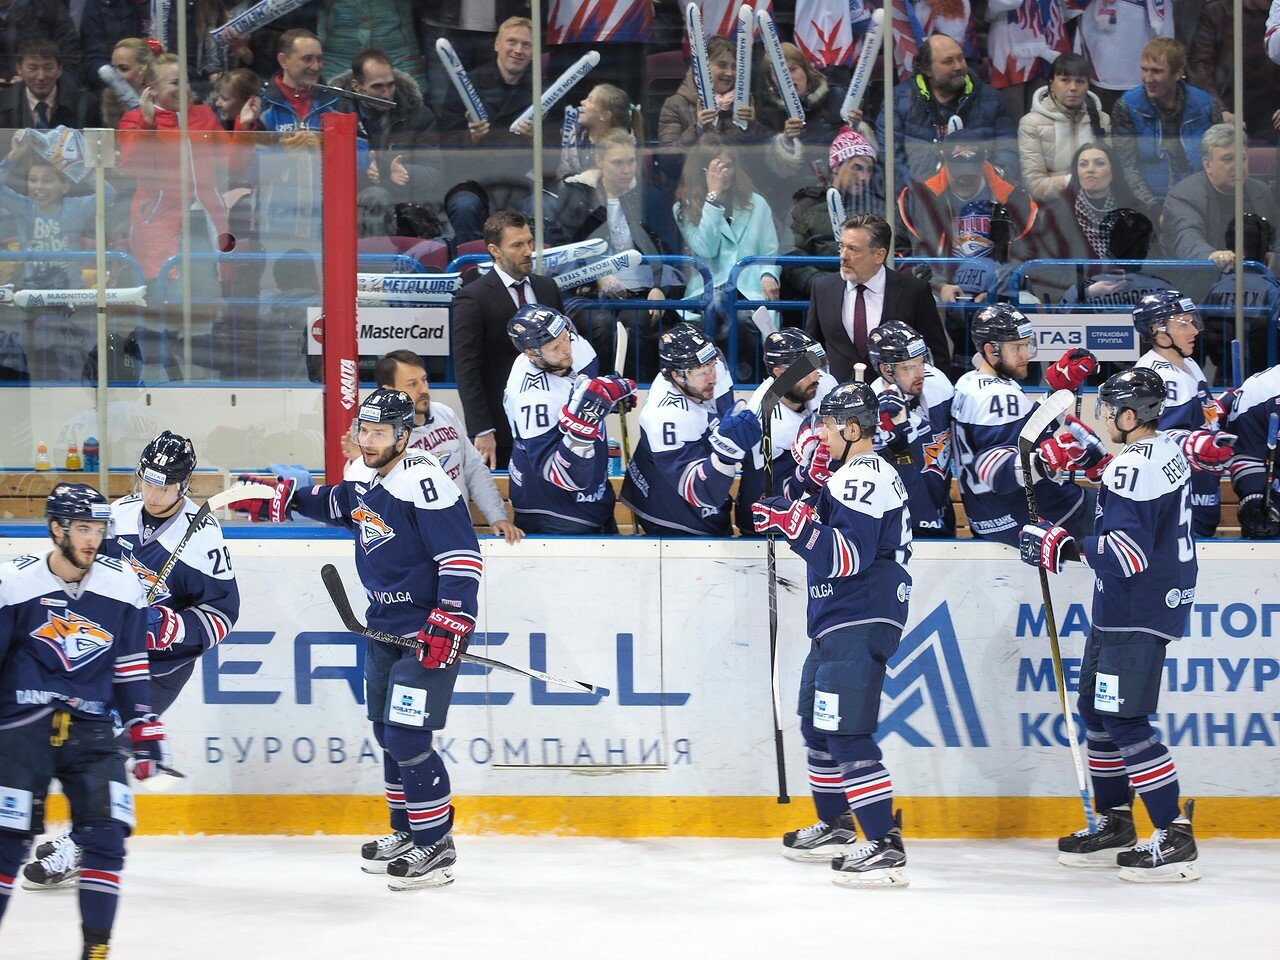 30Плей-офф 2016 Восток Финал Металлург - Салават Юлаев 25.03.2016